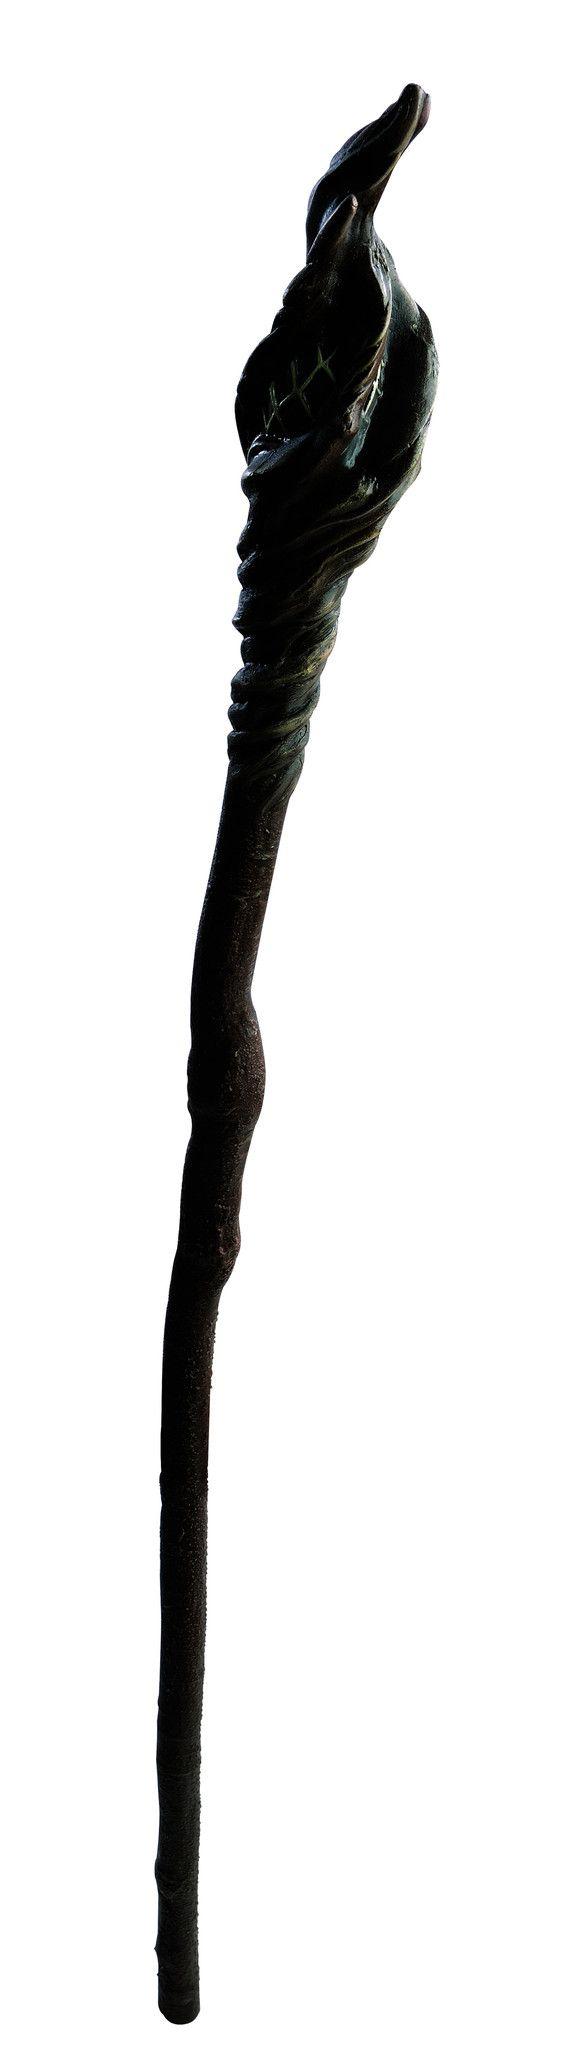 Desolation Of Smaug Hobbit Adult Costume Gandalf Staff